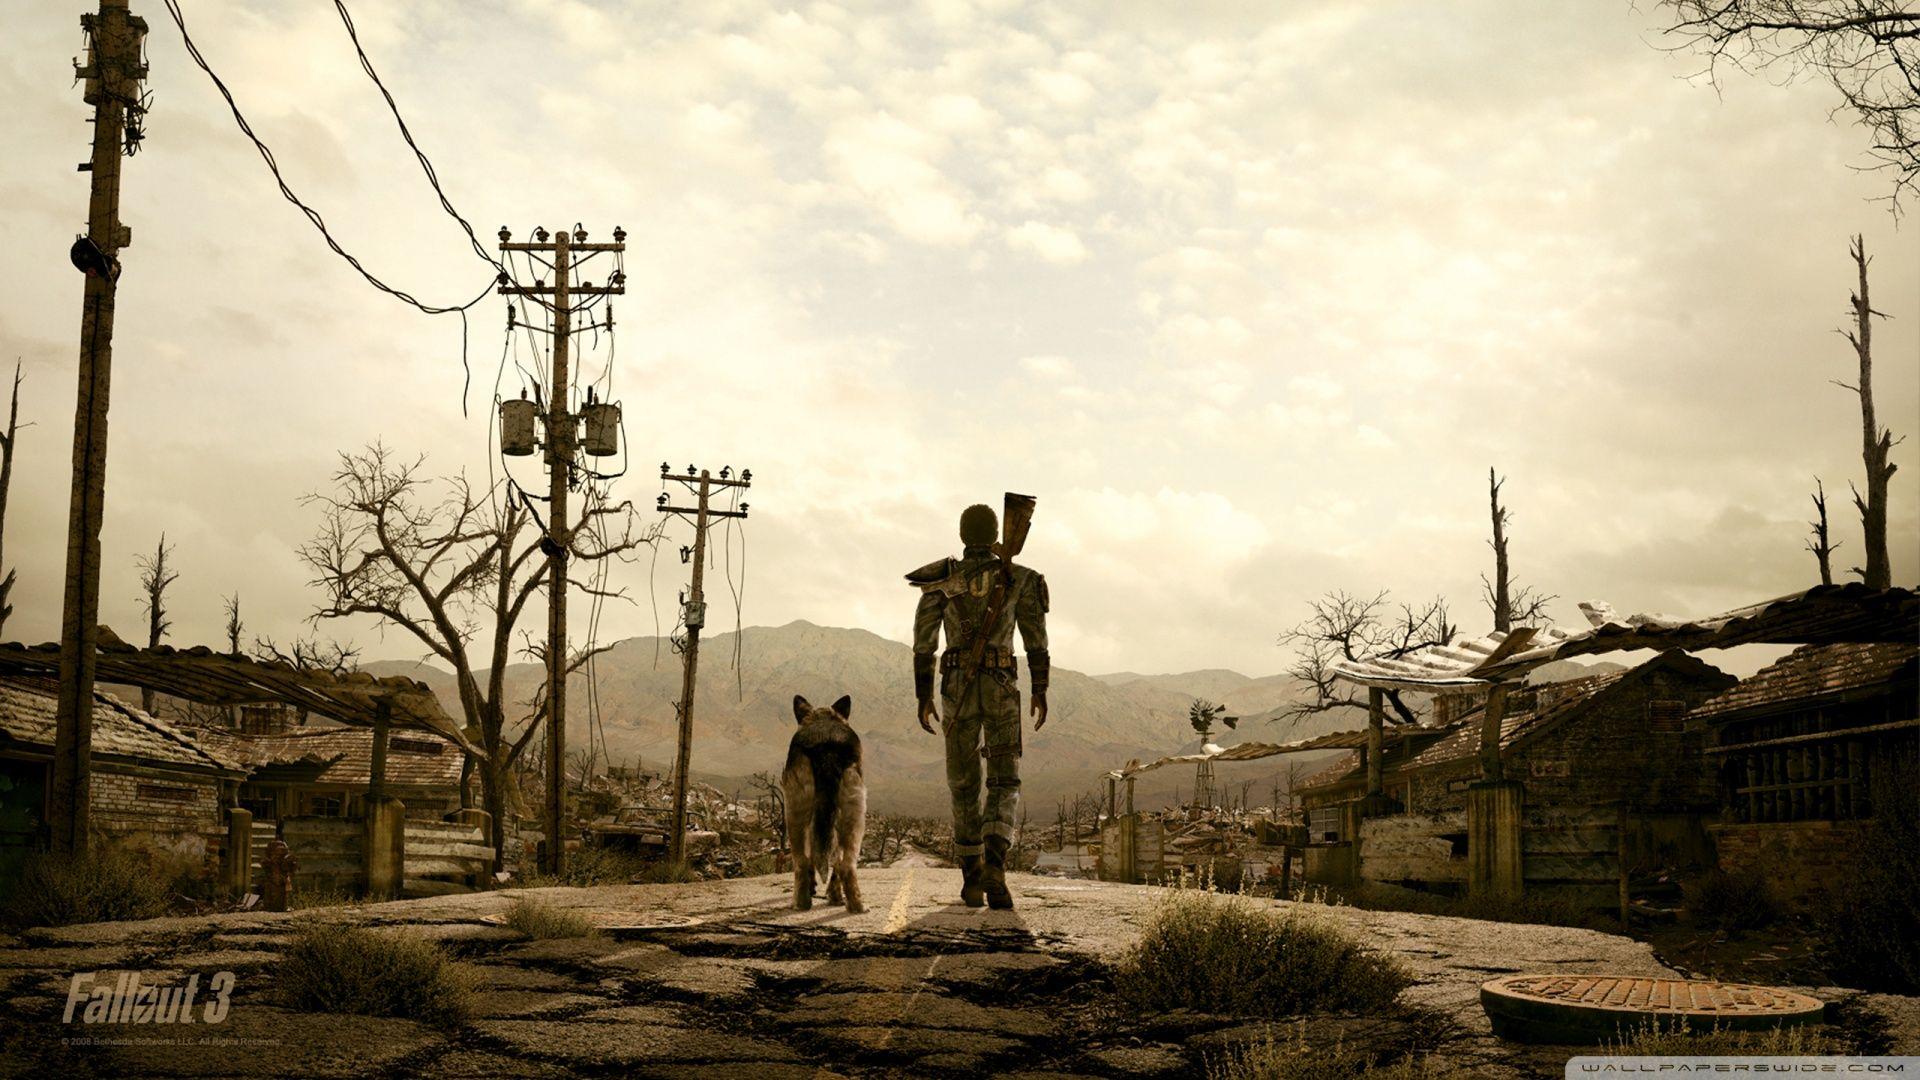 Fallout 3 Wallpaper Full Hd Fallout 3 Wallpaper Photo Art Prints